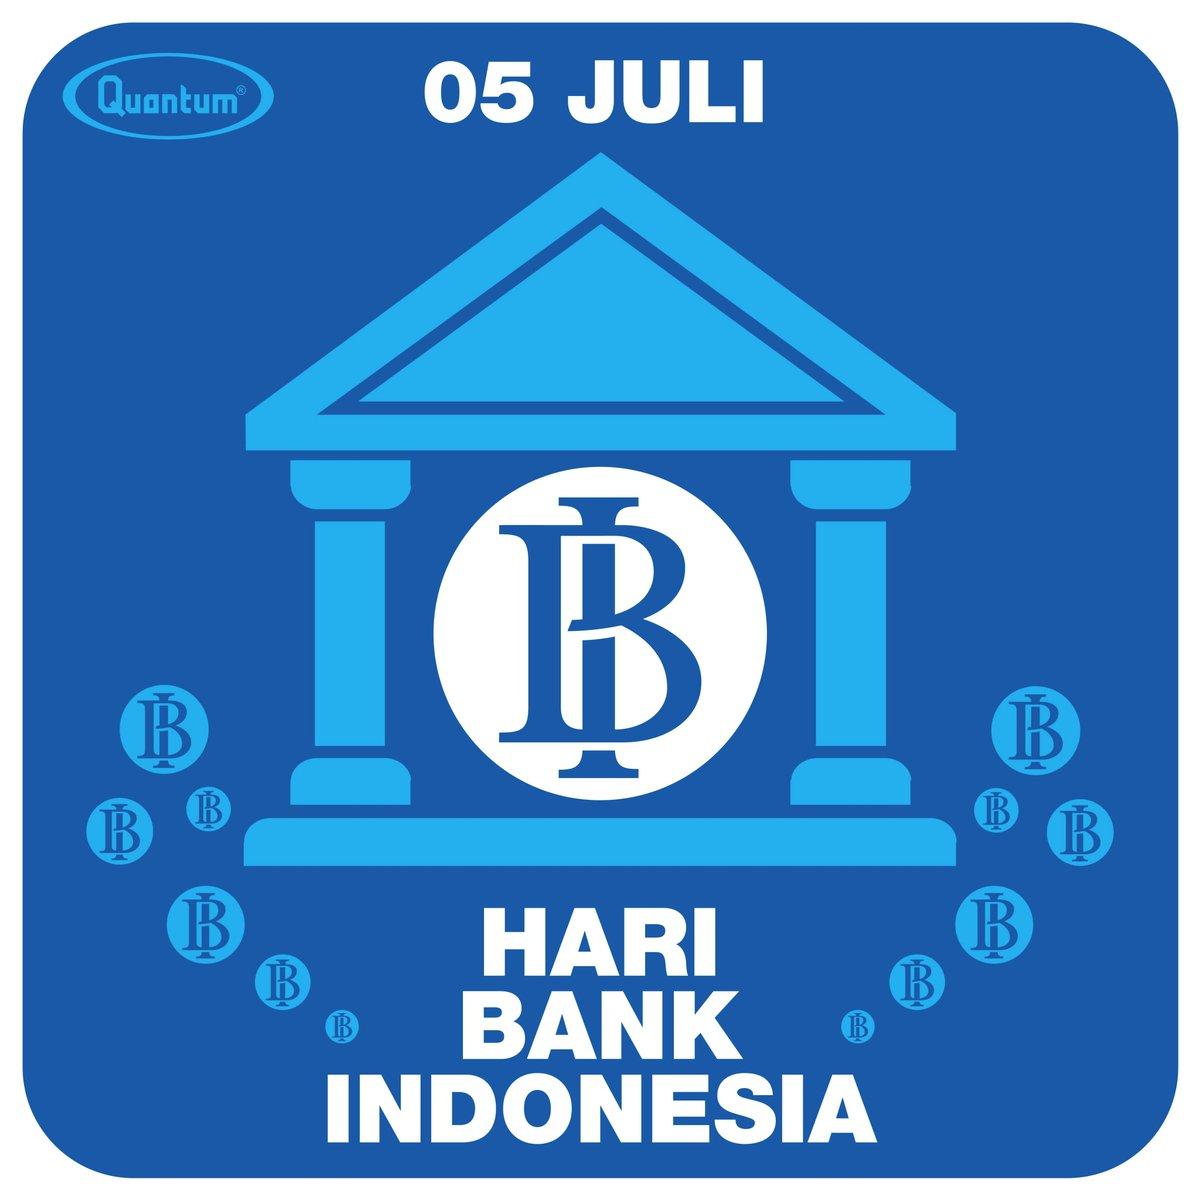 Bank Indonesia bertujuan untuk mencapai & memelihara kestabilan nilai rupiah di Indonesia. Supaya  dapat menetapkan & melaksanakan kebijakan moneter, mengatur & menjaga kelancaran sistem pembayaran, sama mengatur & mengawasi  perbankan di Indonesia. Selamat #haribankindonesia